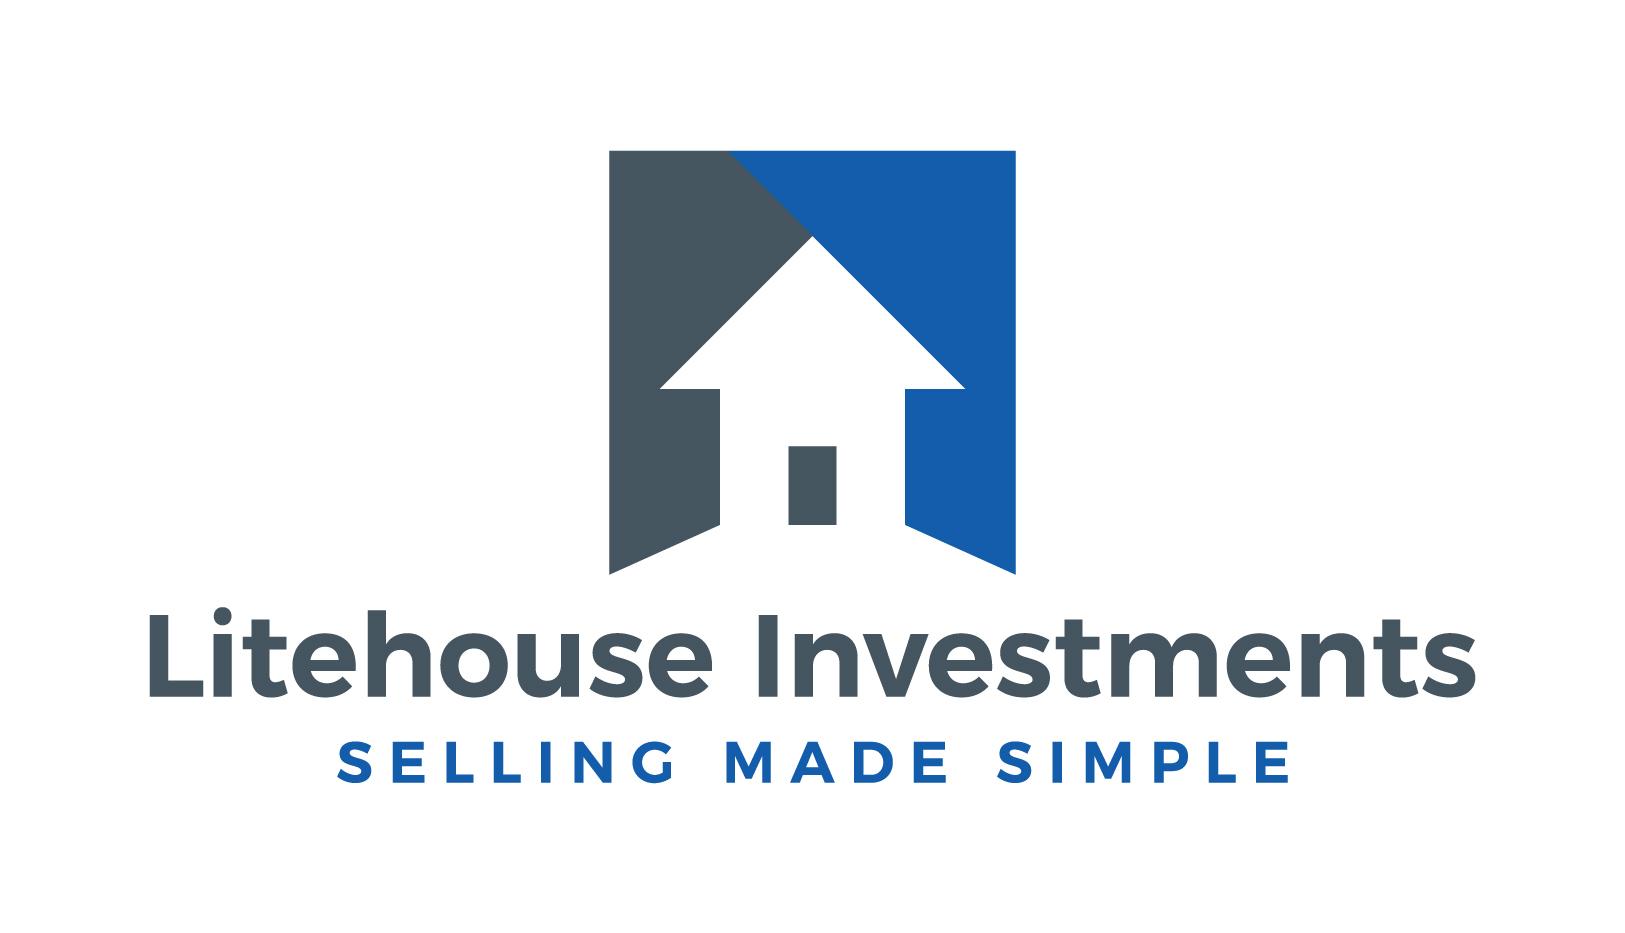 Litehouse Investments logo